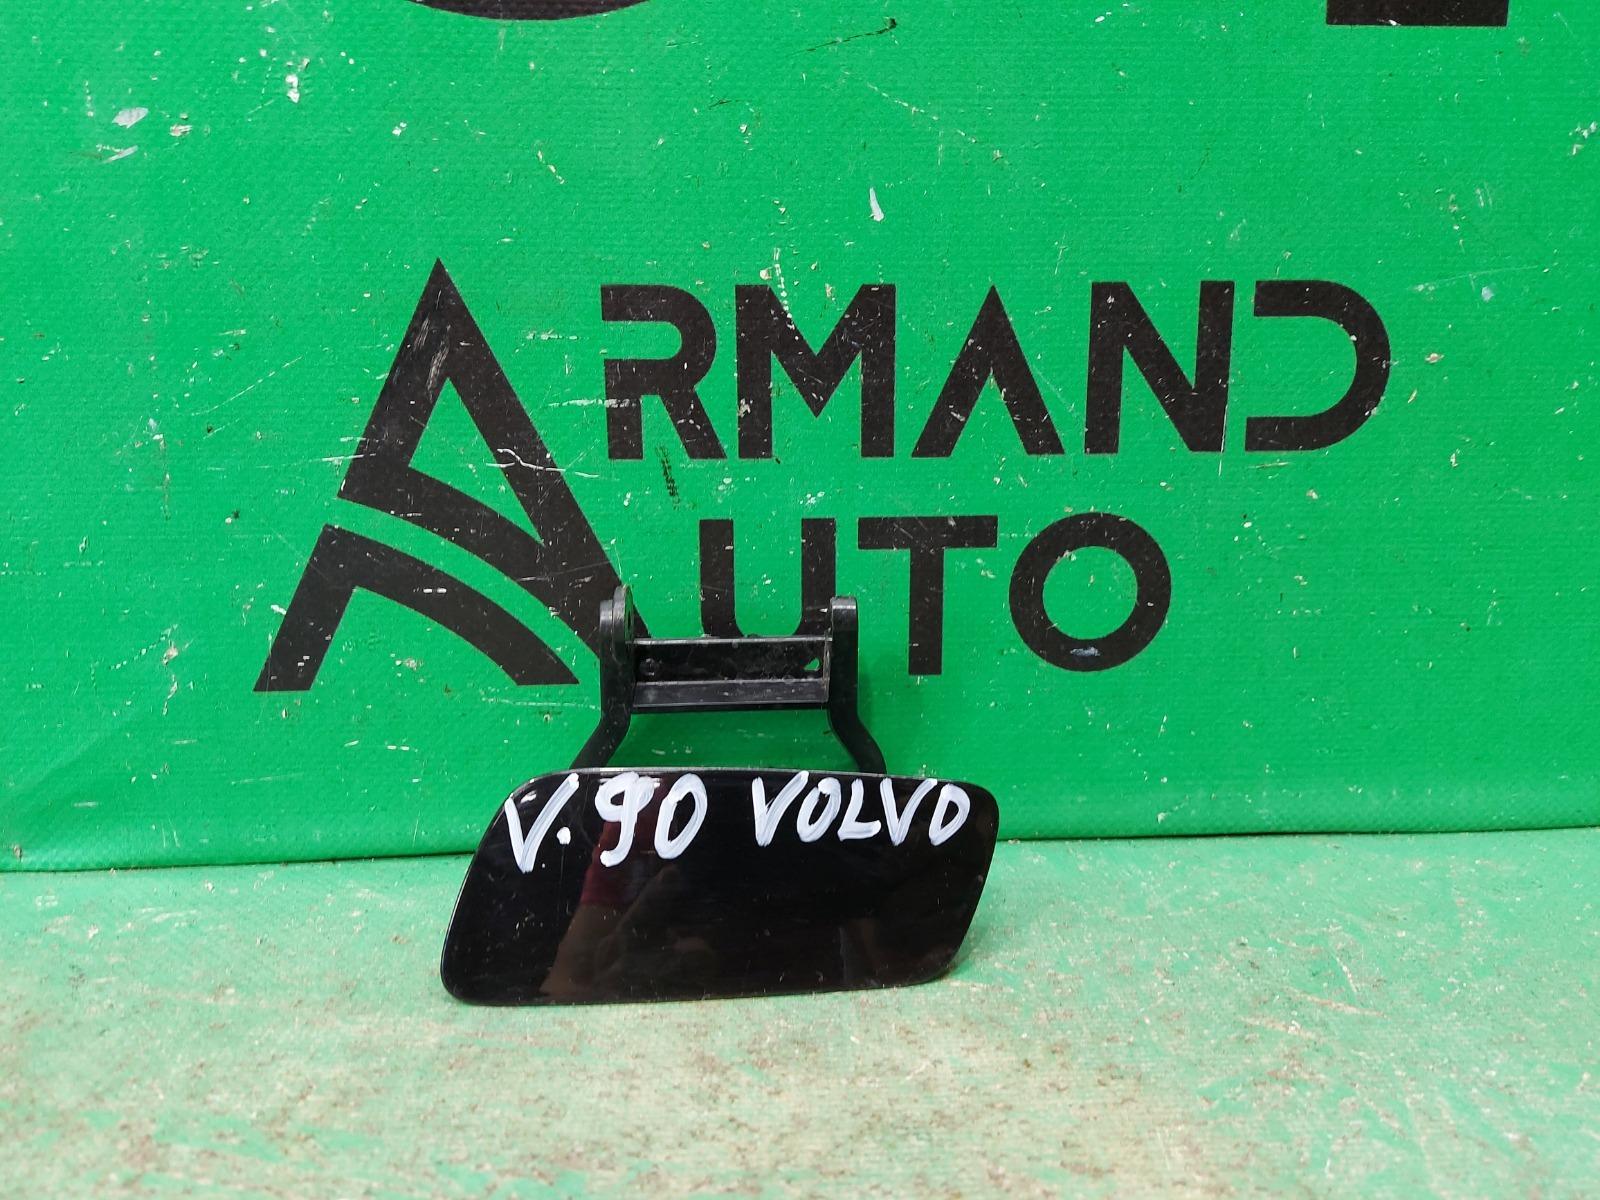 Крышка форсунки омывателя Volvo V90 Cross Country 1 2016 левая (б/у)